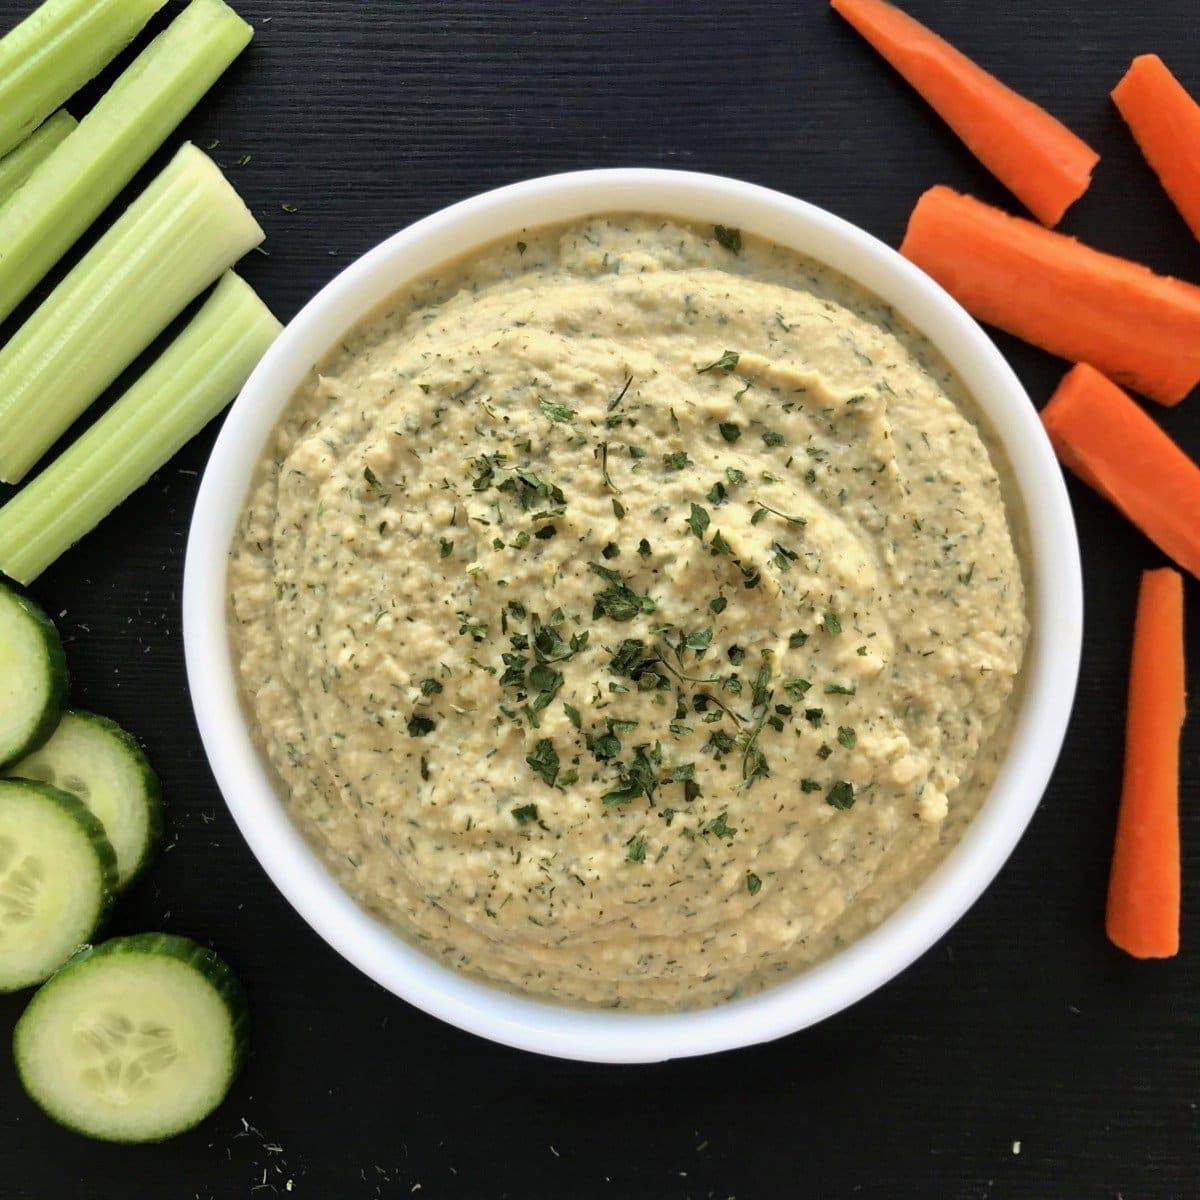 Dill Pickle Hummus